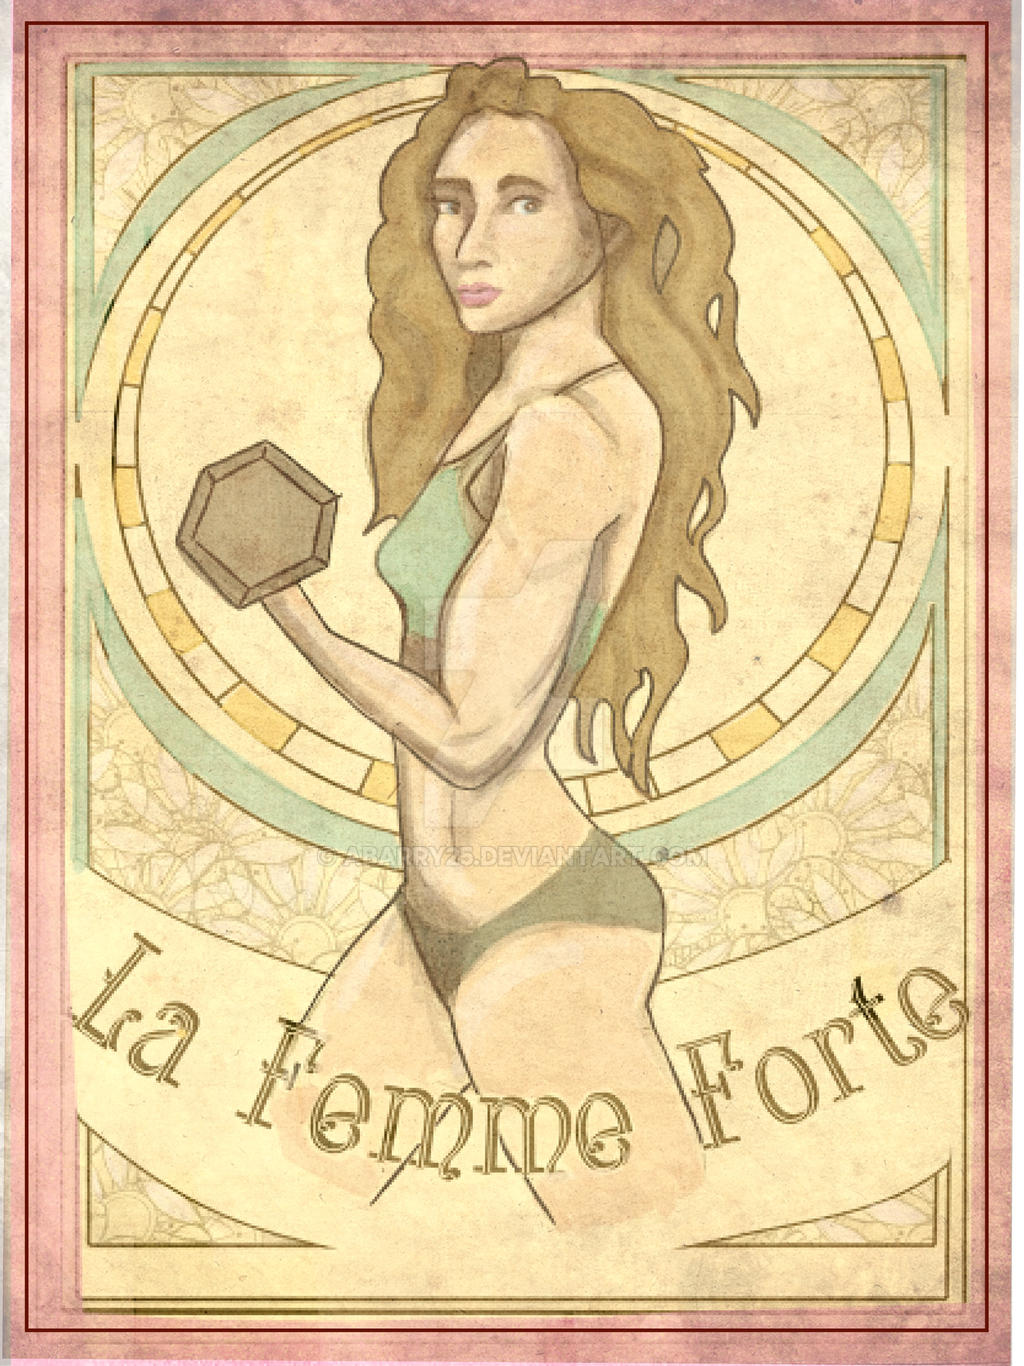 foto de Art Nouveau (La Femme Forte) by abarry25 on DeviantArt